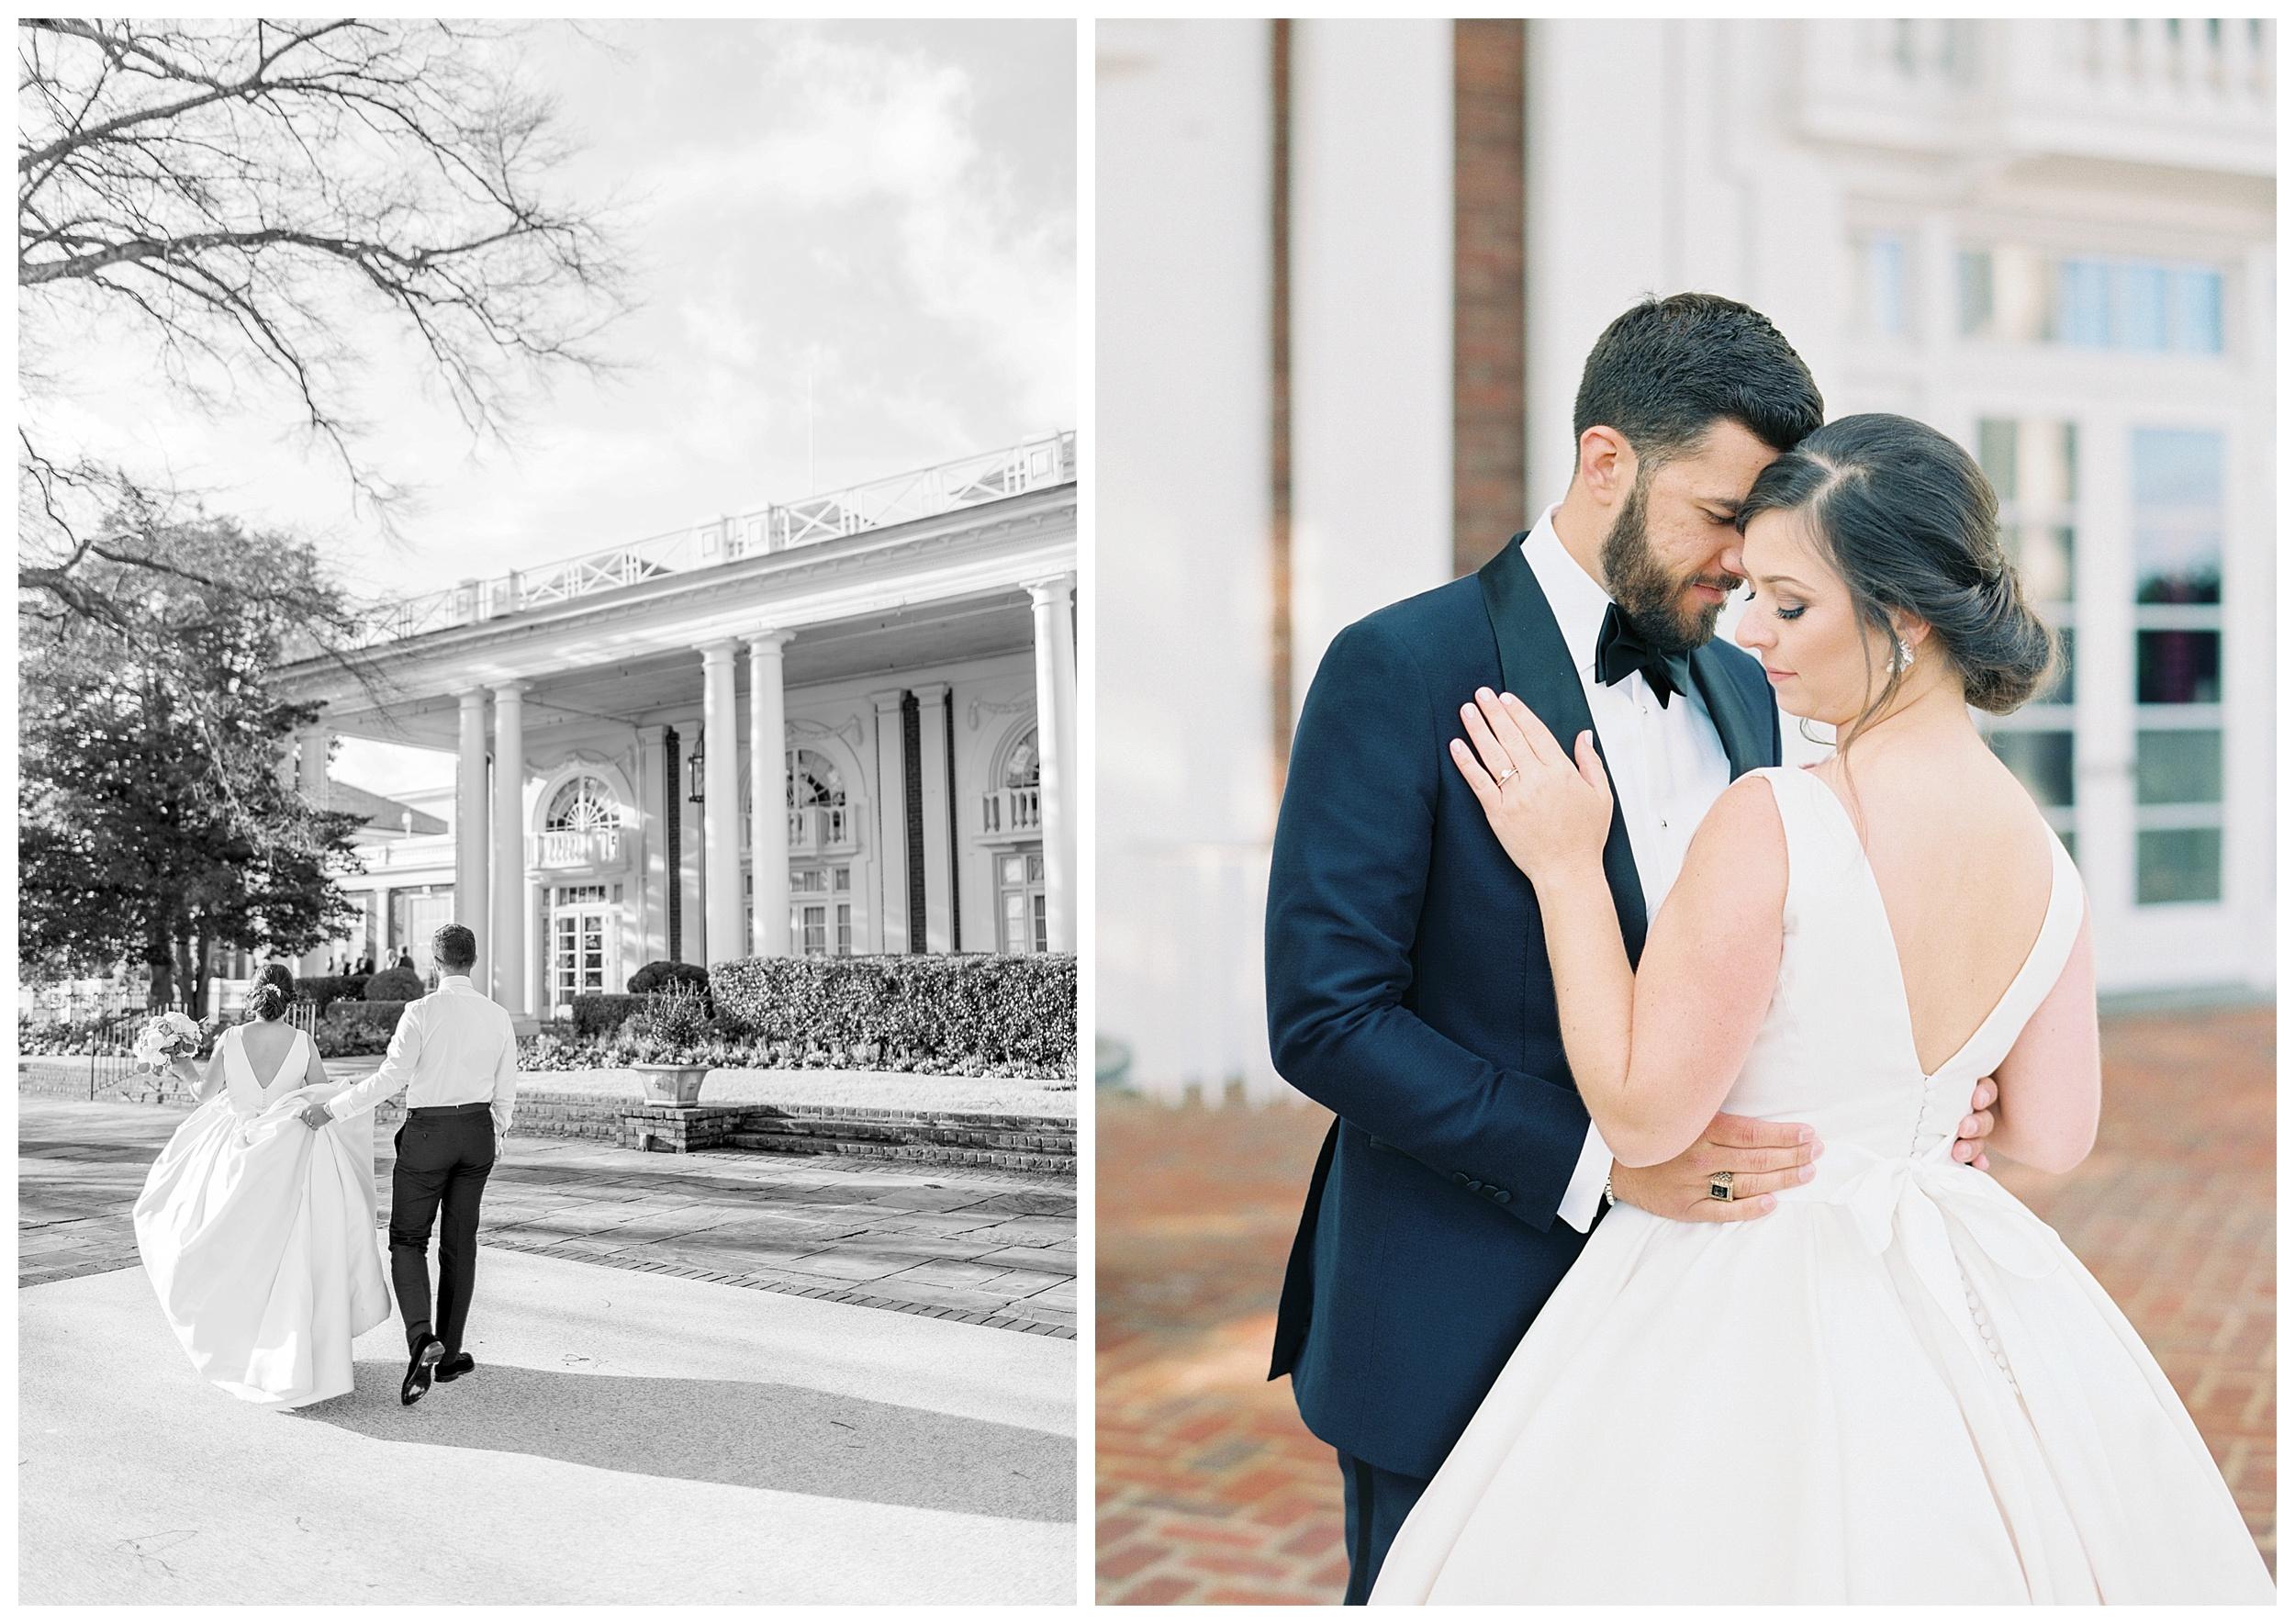 Country Club of Virginia Wedding | Richmond Wedding Photographer_0125.jpg